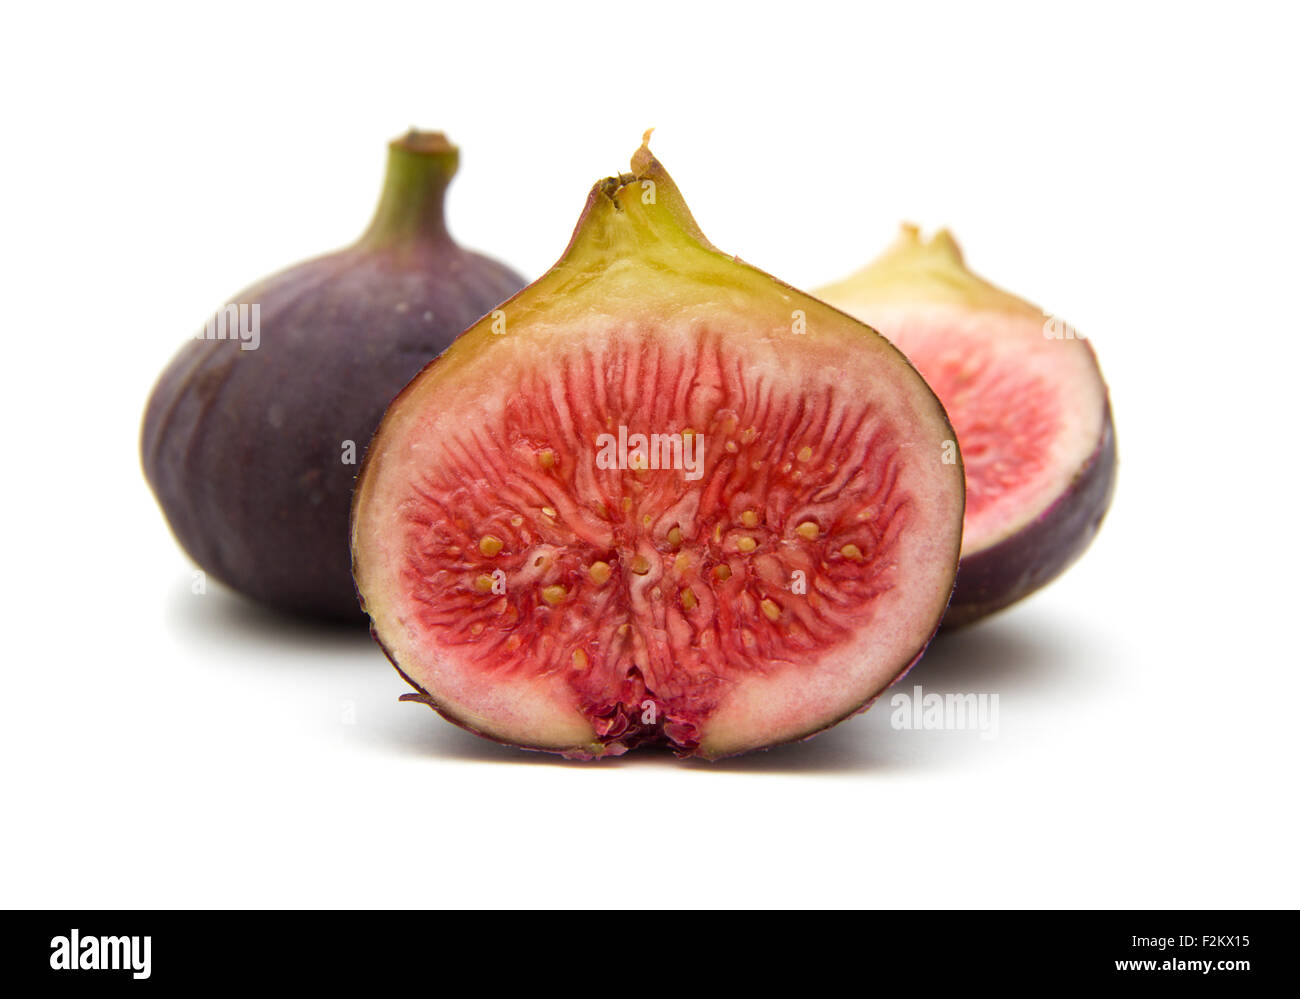 ripe purple figs isolated on white background - Stock Image